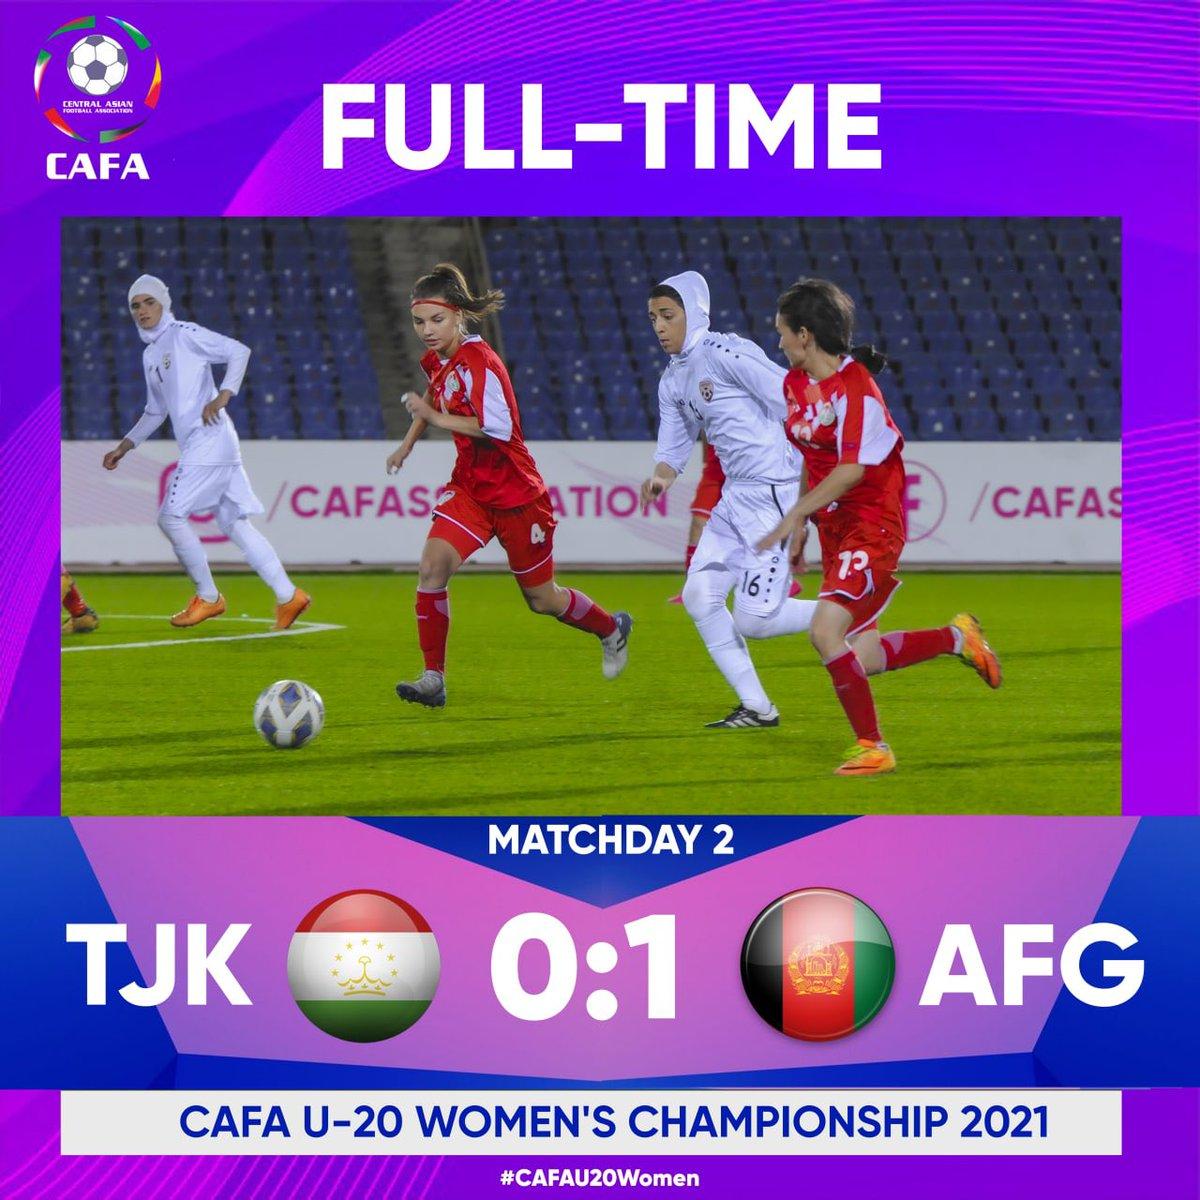 CAFA U-20 Women's Championship 2021  FULL TIME   MD 2  🇹🇯 Tajikistan 0:1 Afghanistan 🇦🇫   @cafassociation   #CAFAU20Women #Afghanistan #Iran #KyrgyzRepublic #Tajikistan #Uzbekistan https://t.co/xmITSTHYmZ